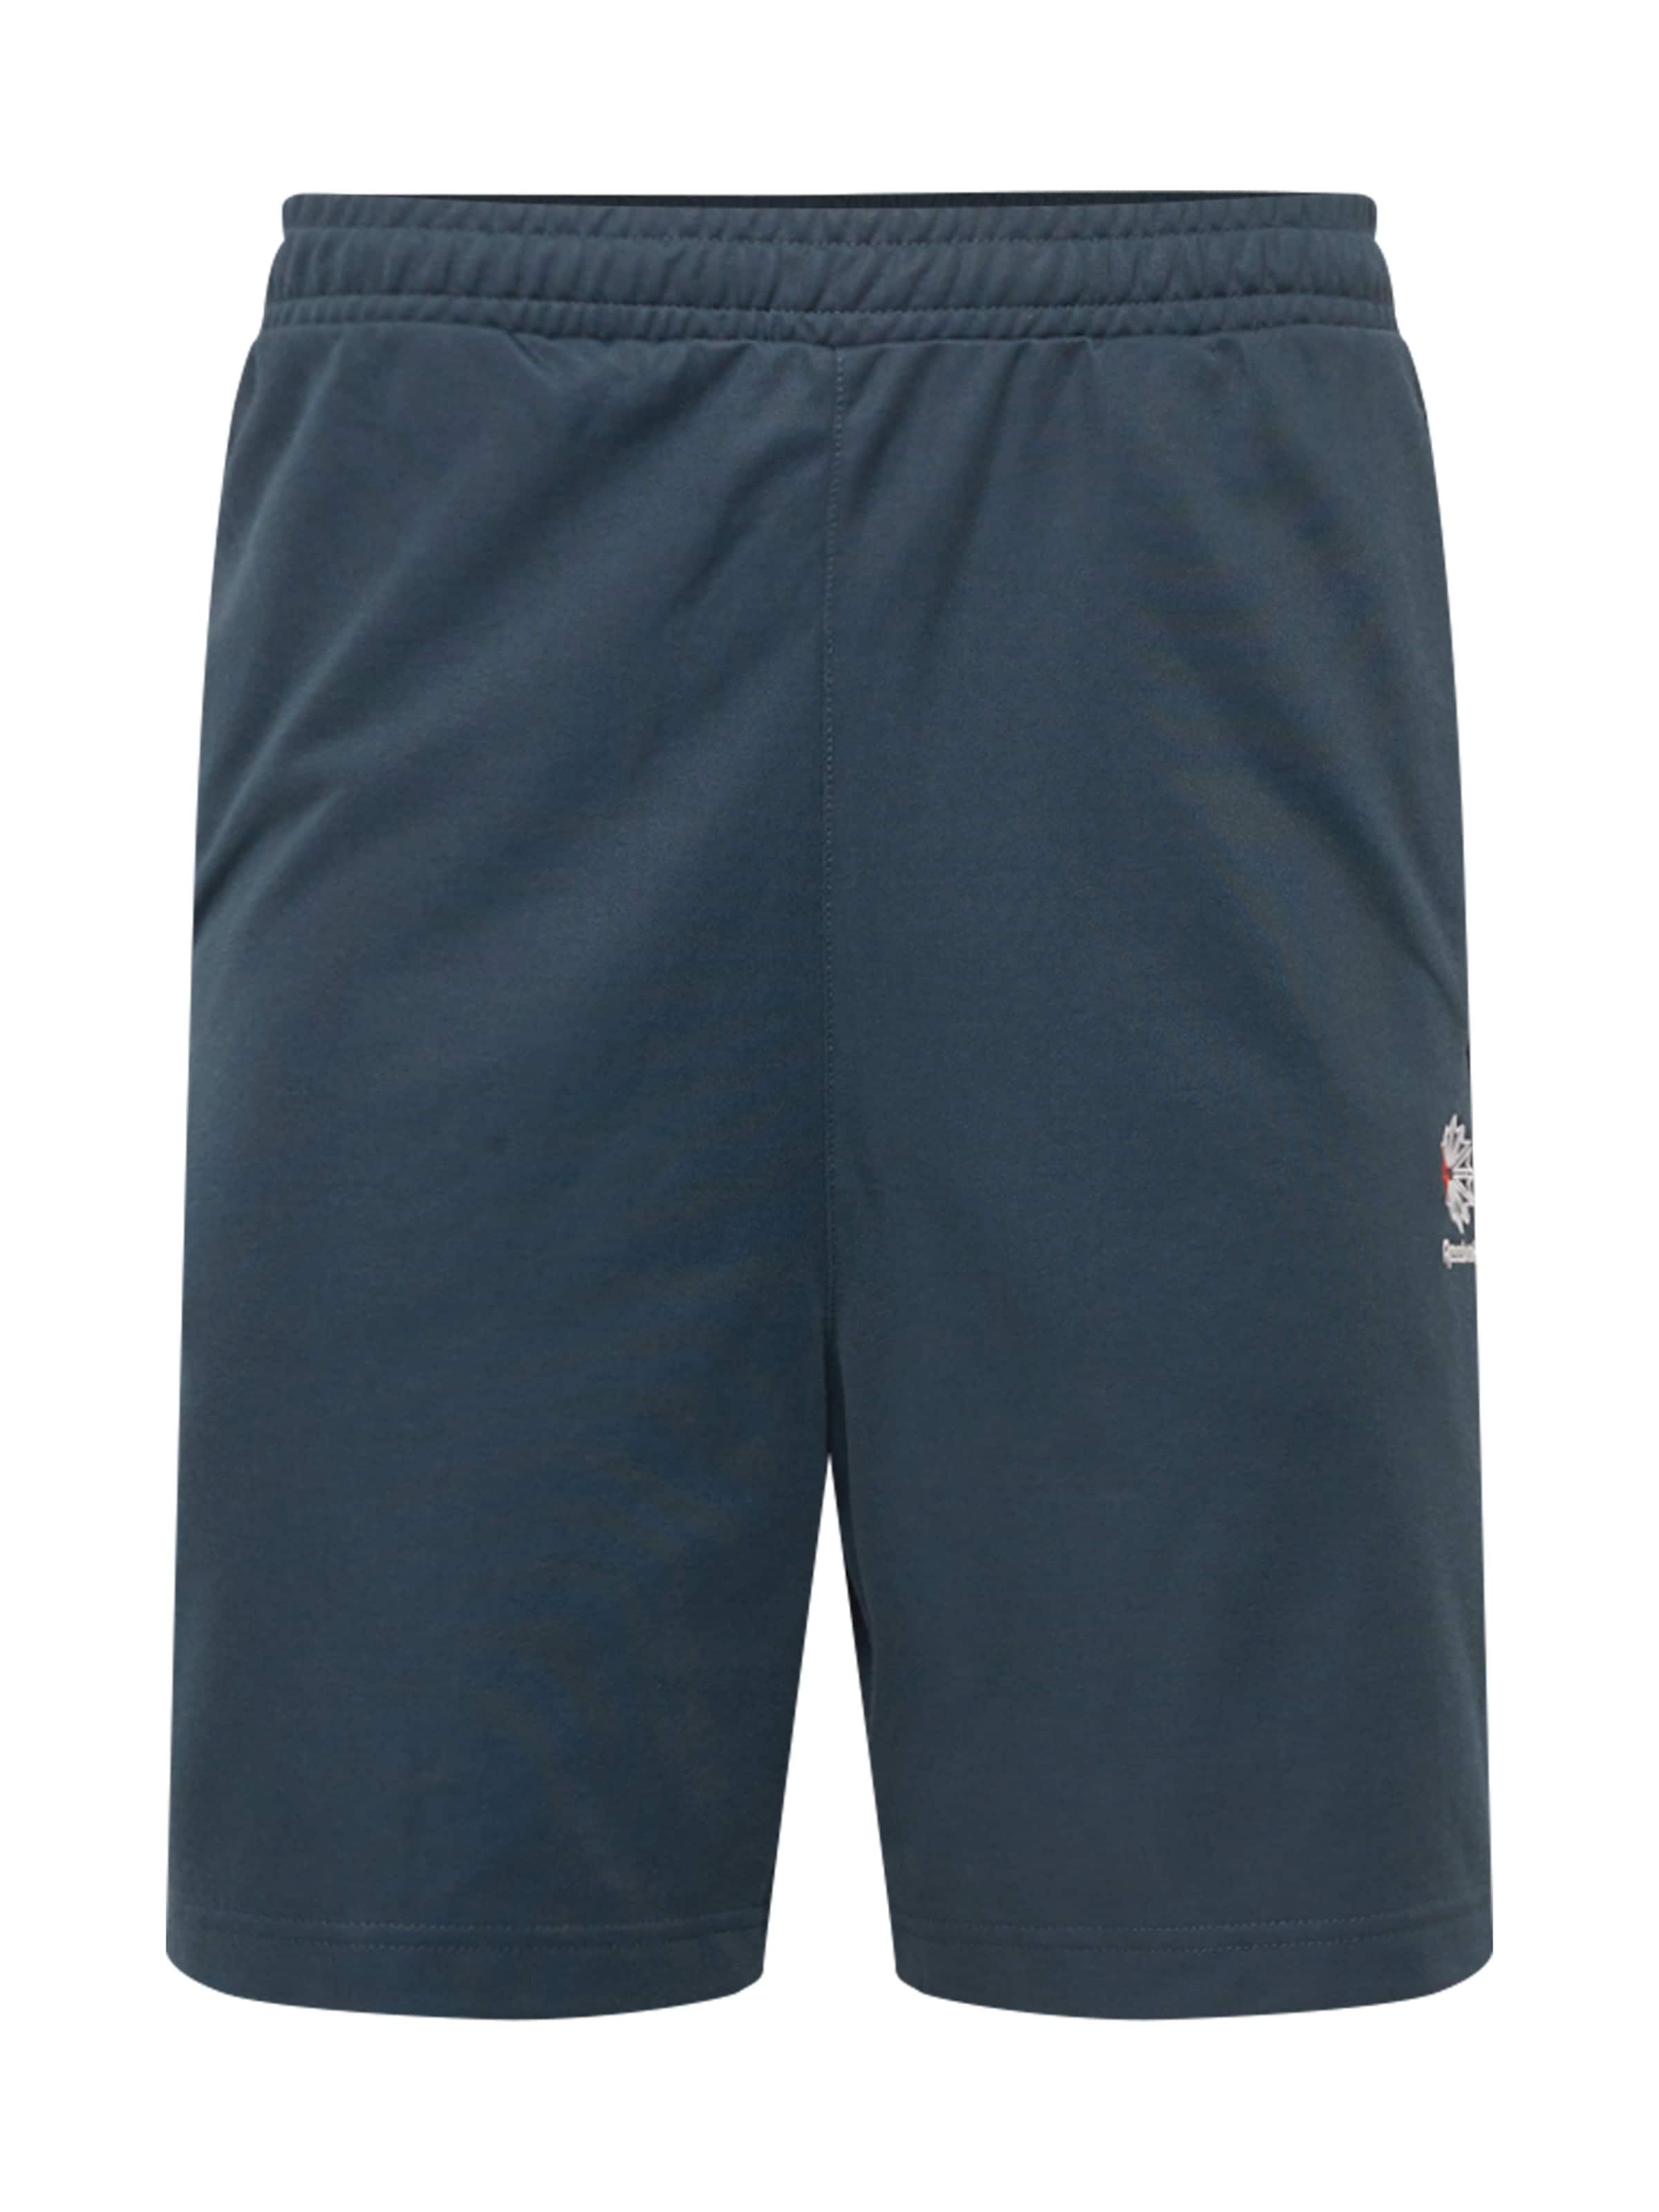 Pantalon NoirBlanc En Reebok Classic Classic Classic Pantalon Pantalon Reebok En Reebok NoirBlanc 34ARjL5q